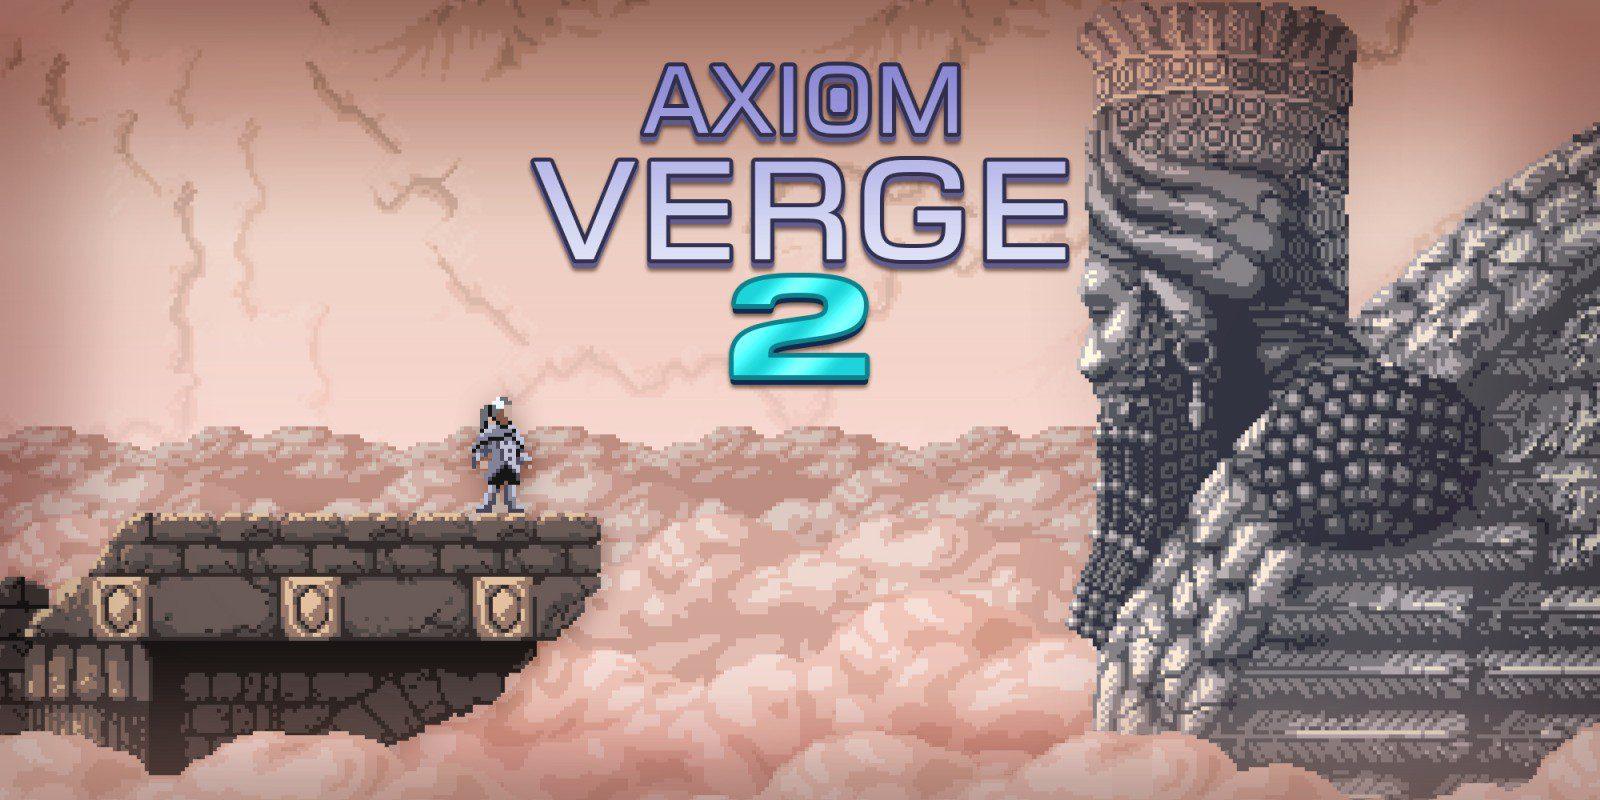 Axiom Verge 2 review